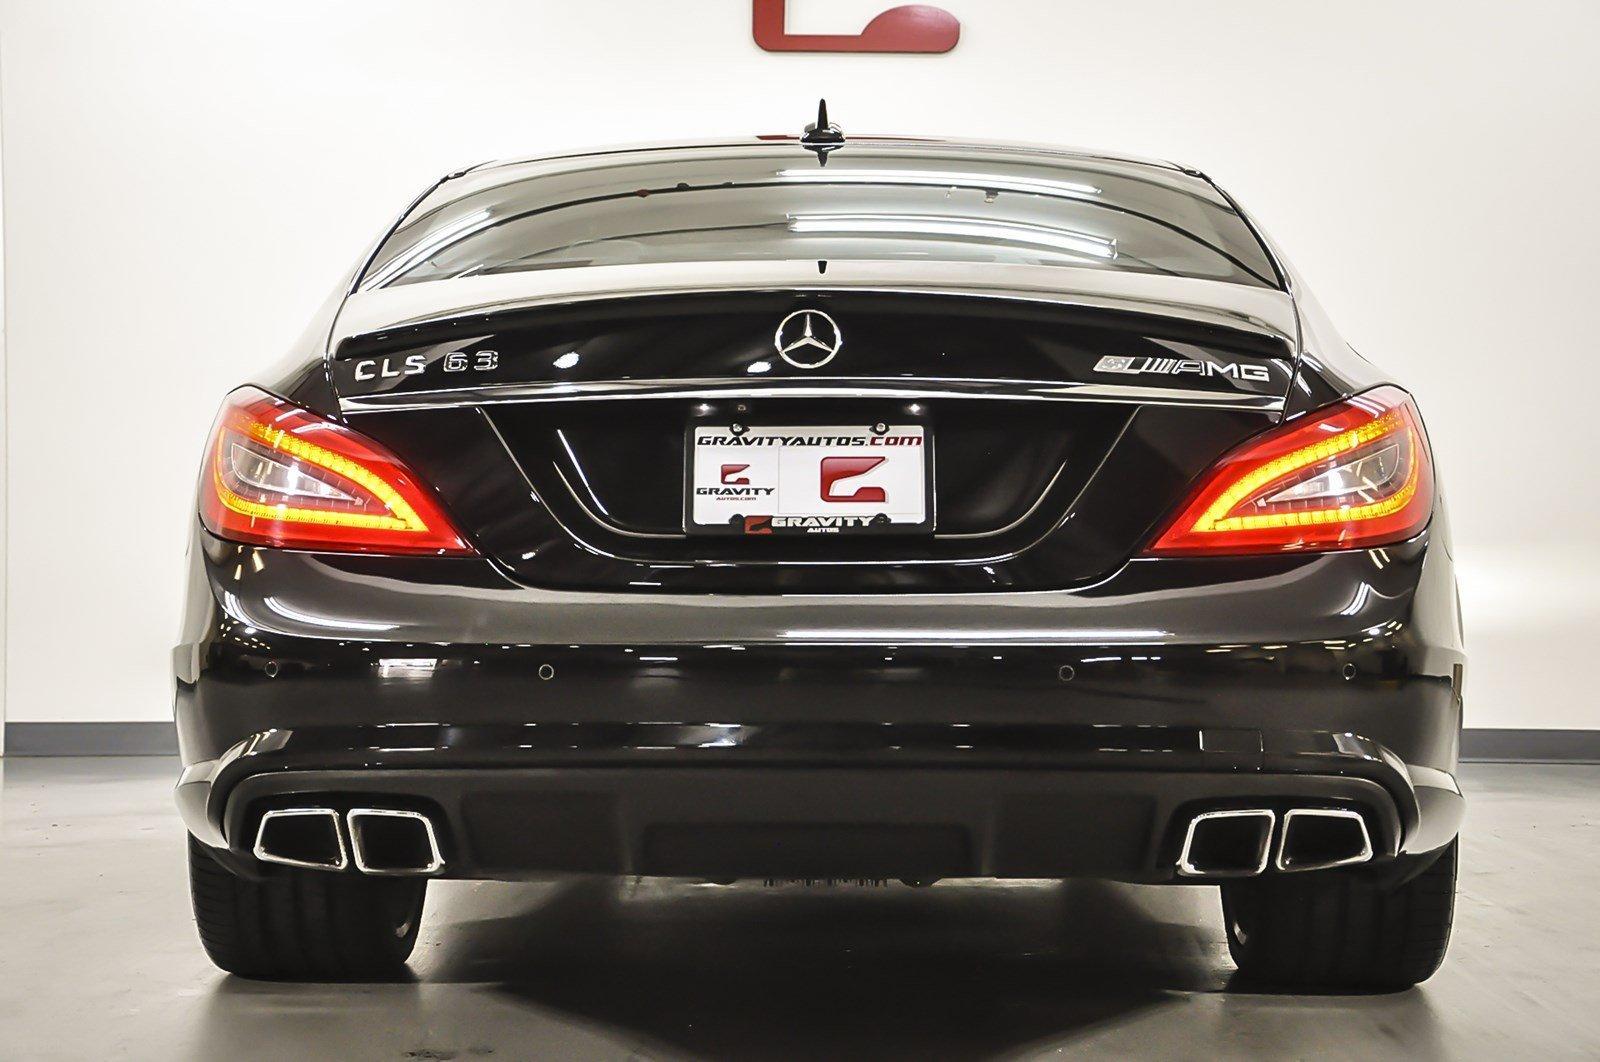 Used 2014 Mercedes-Benz CLS-Class CLS 63 AMG S-Model | Marietta, GA